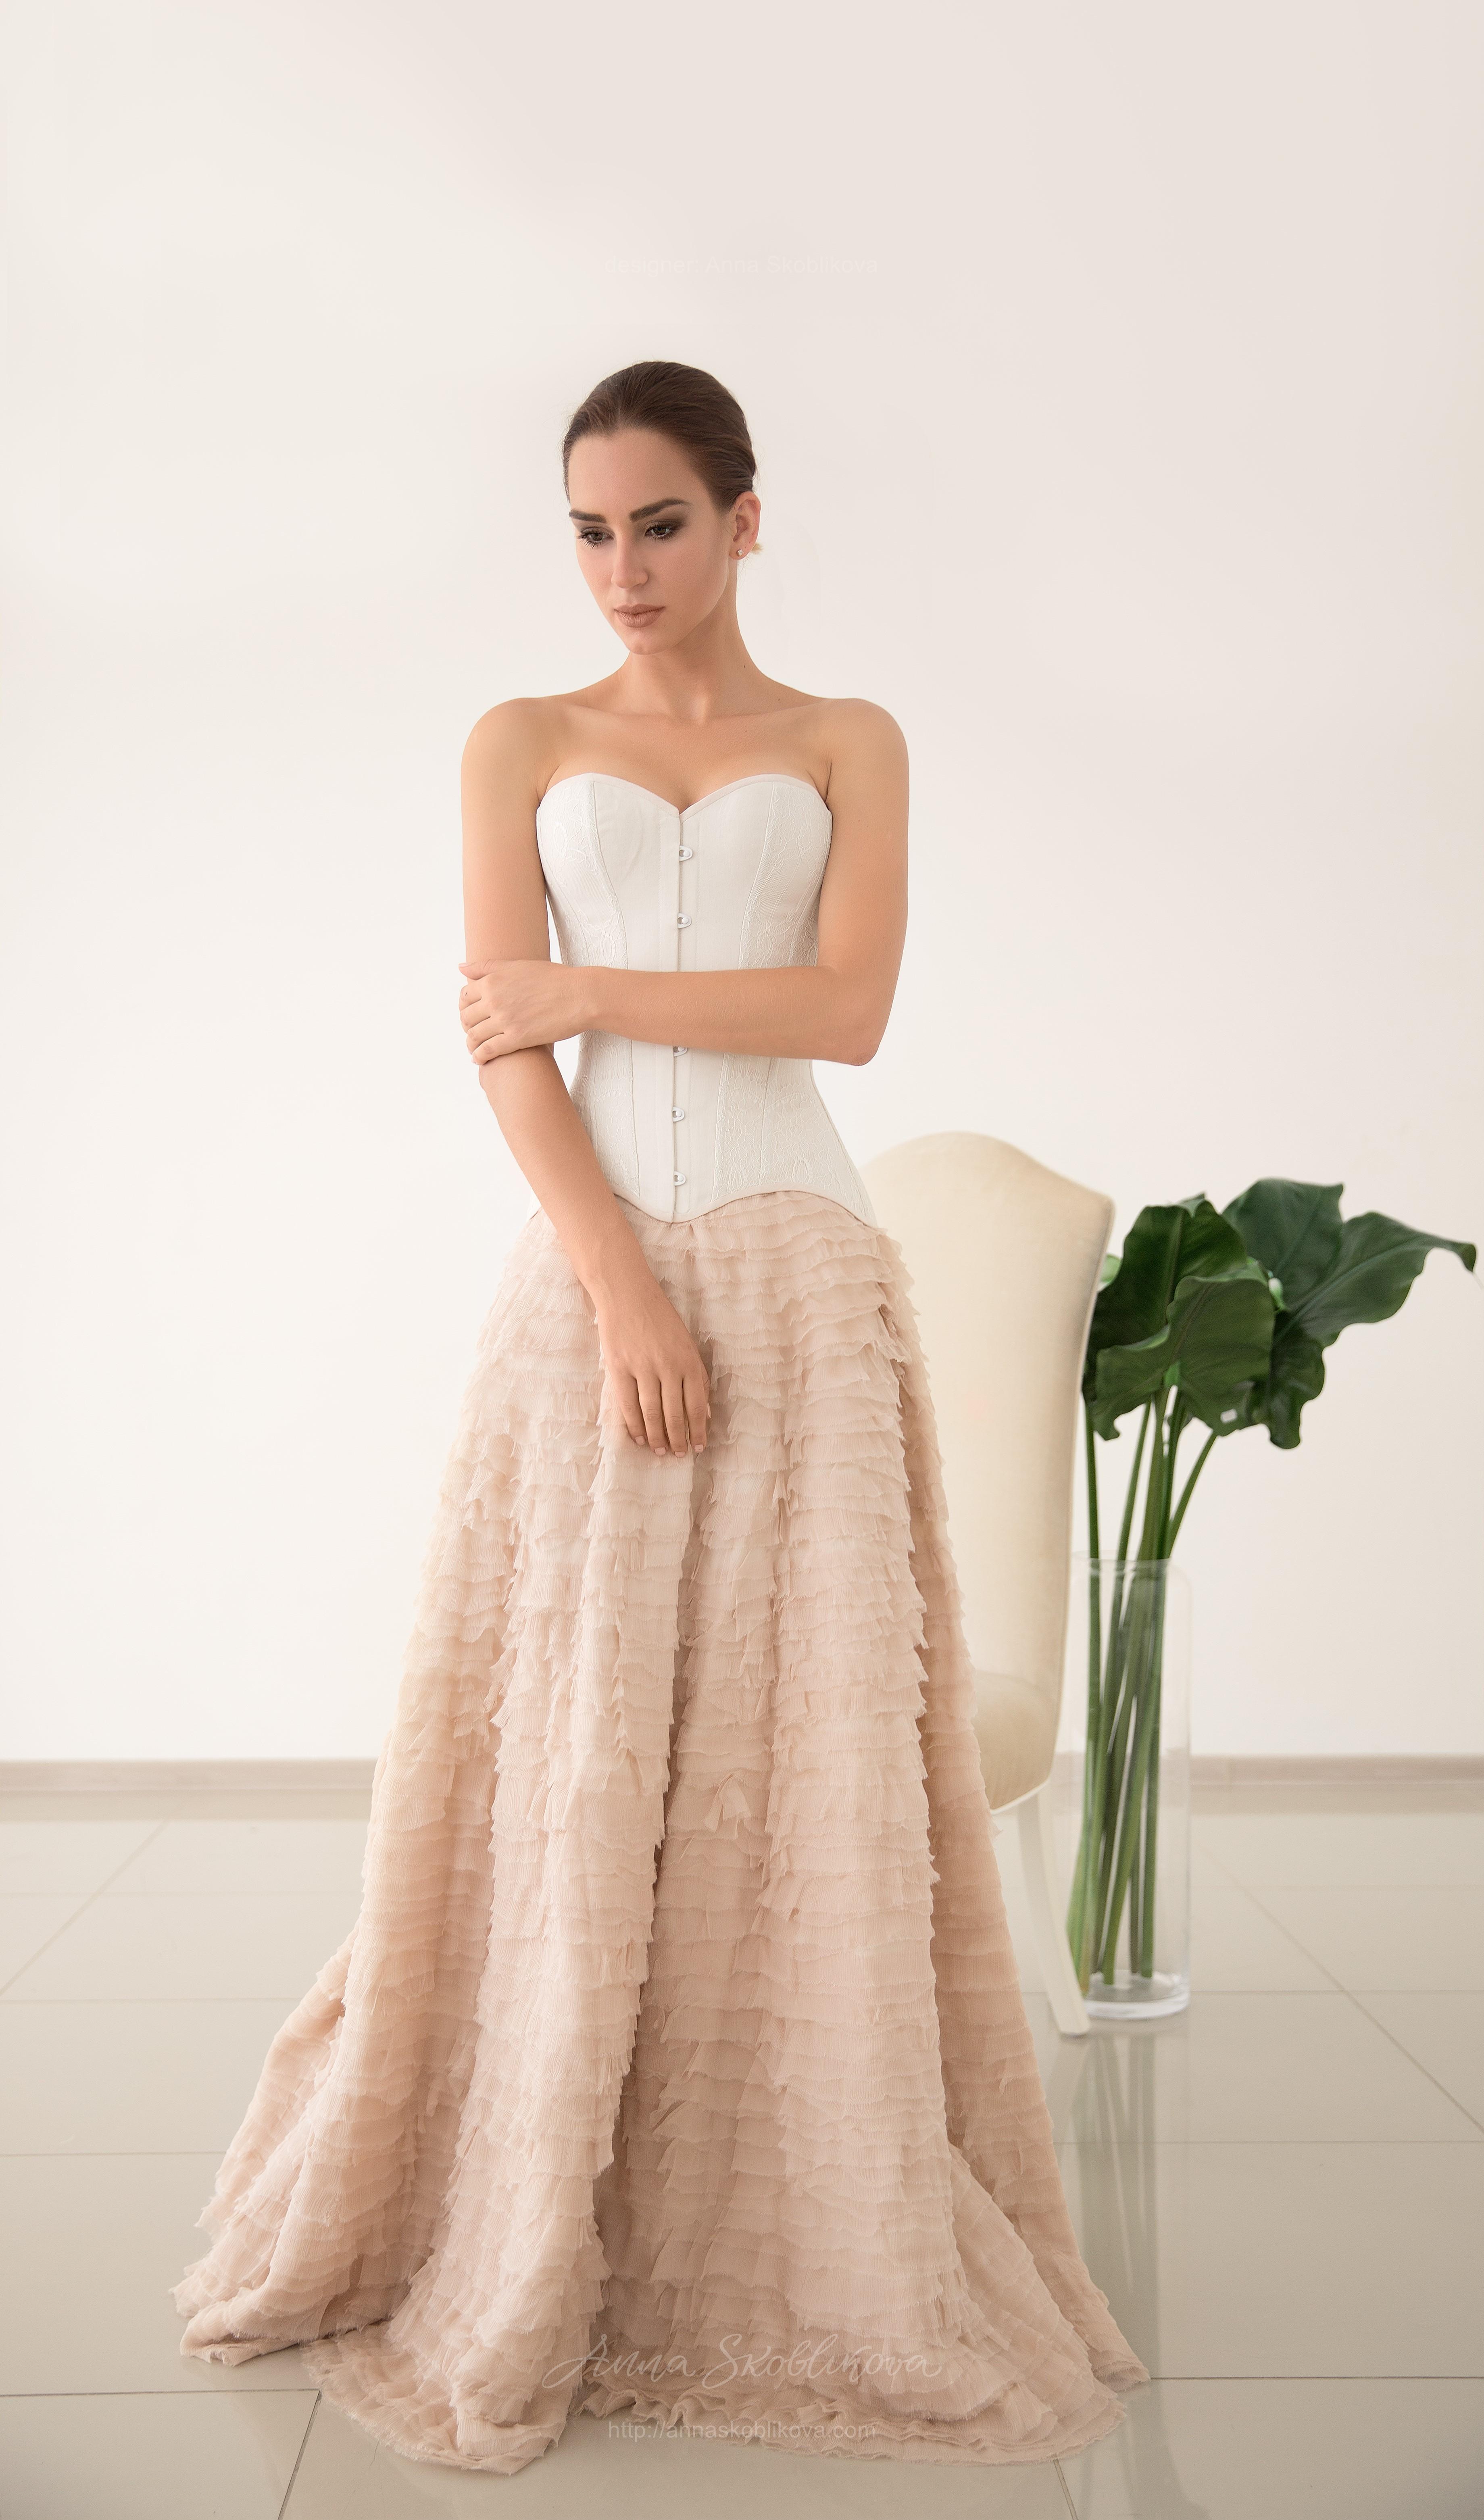 Silk Wedding Dress.Luxurious Natural Silk Wedding Skirt Anna Skoblikova